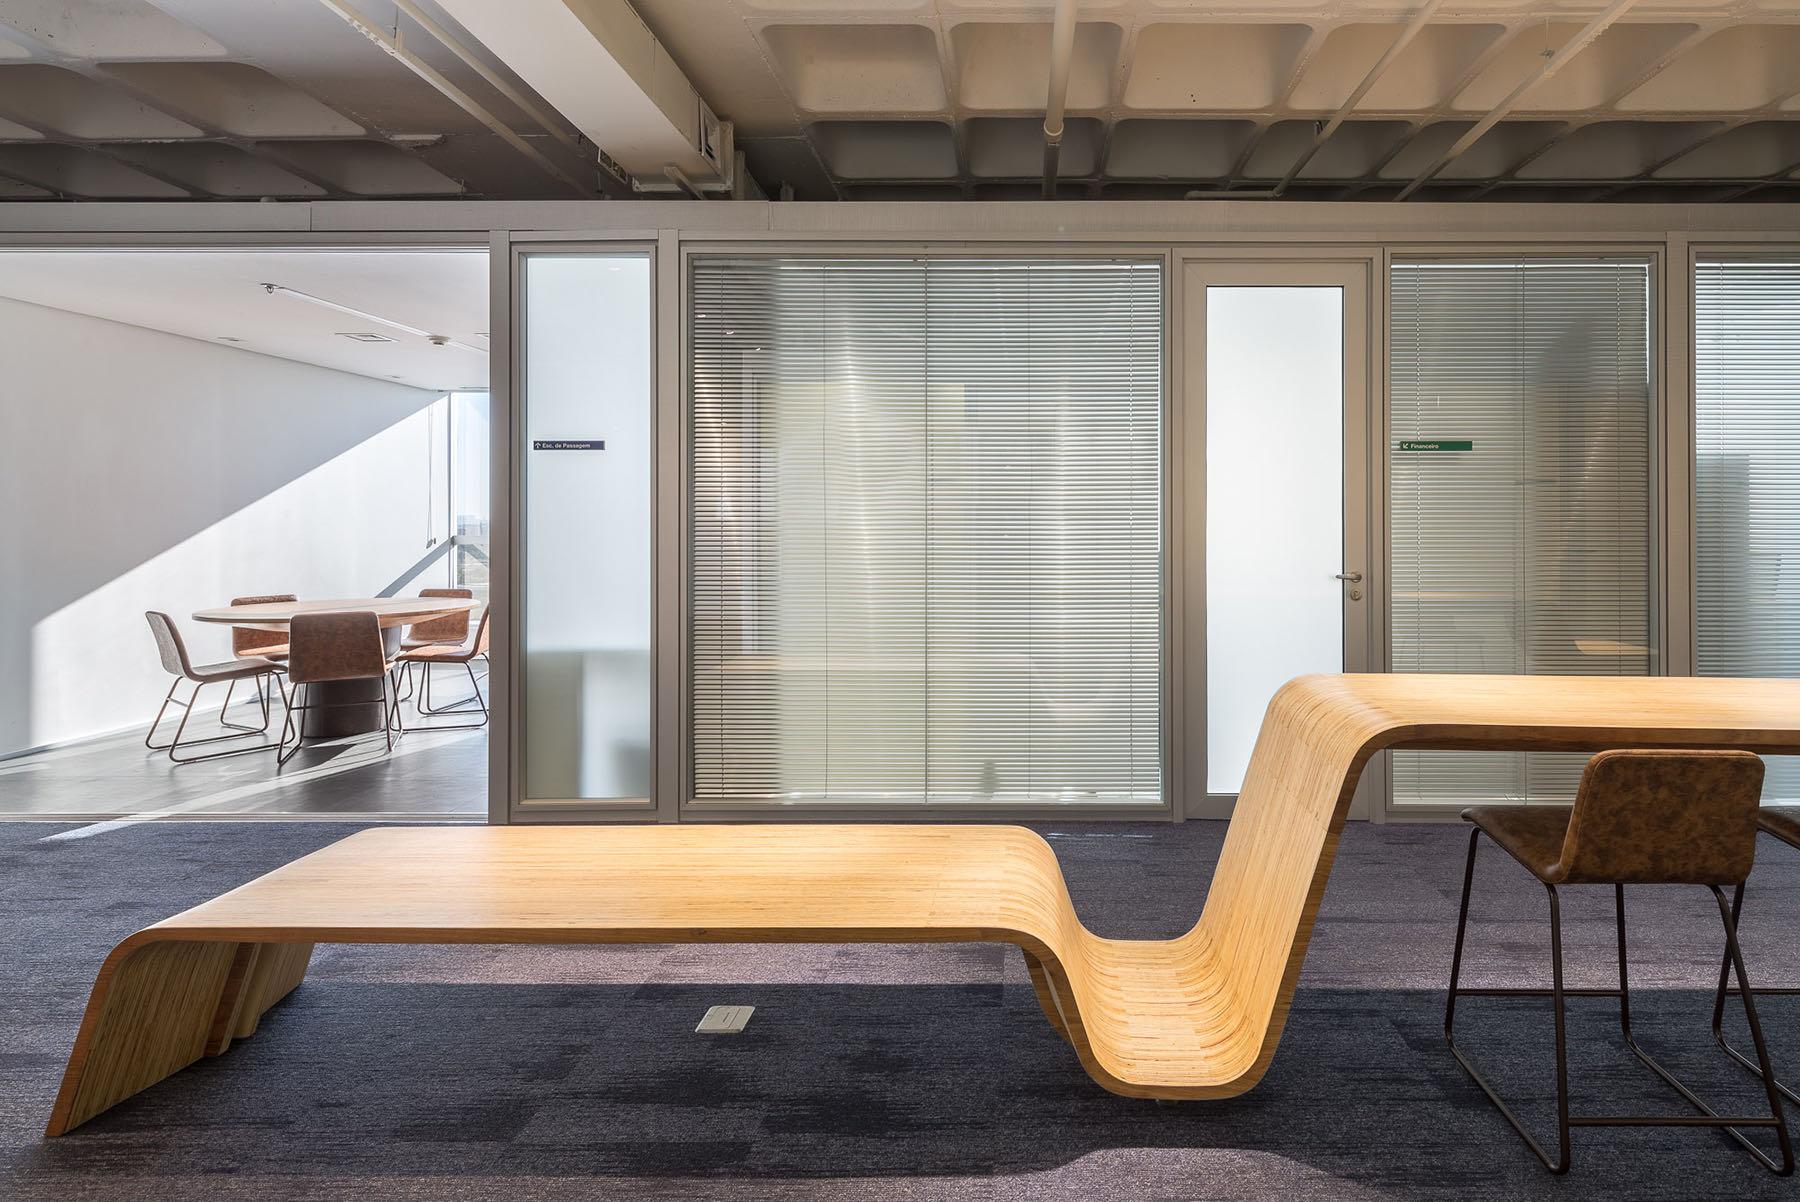 french-development-agency-office-18